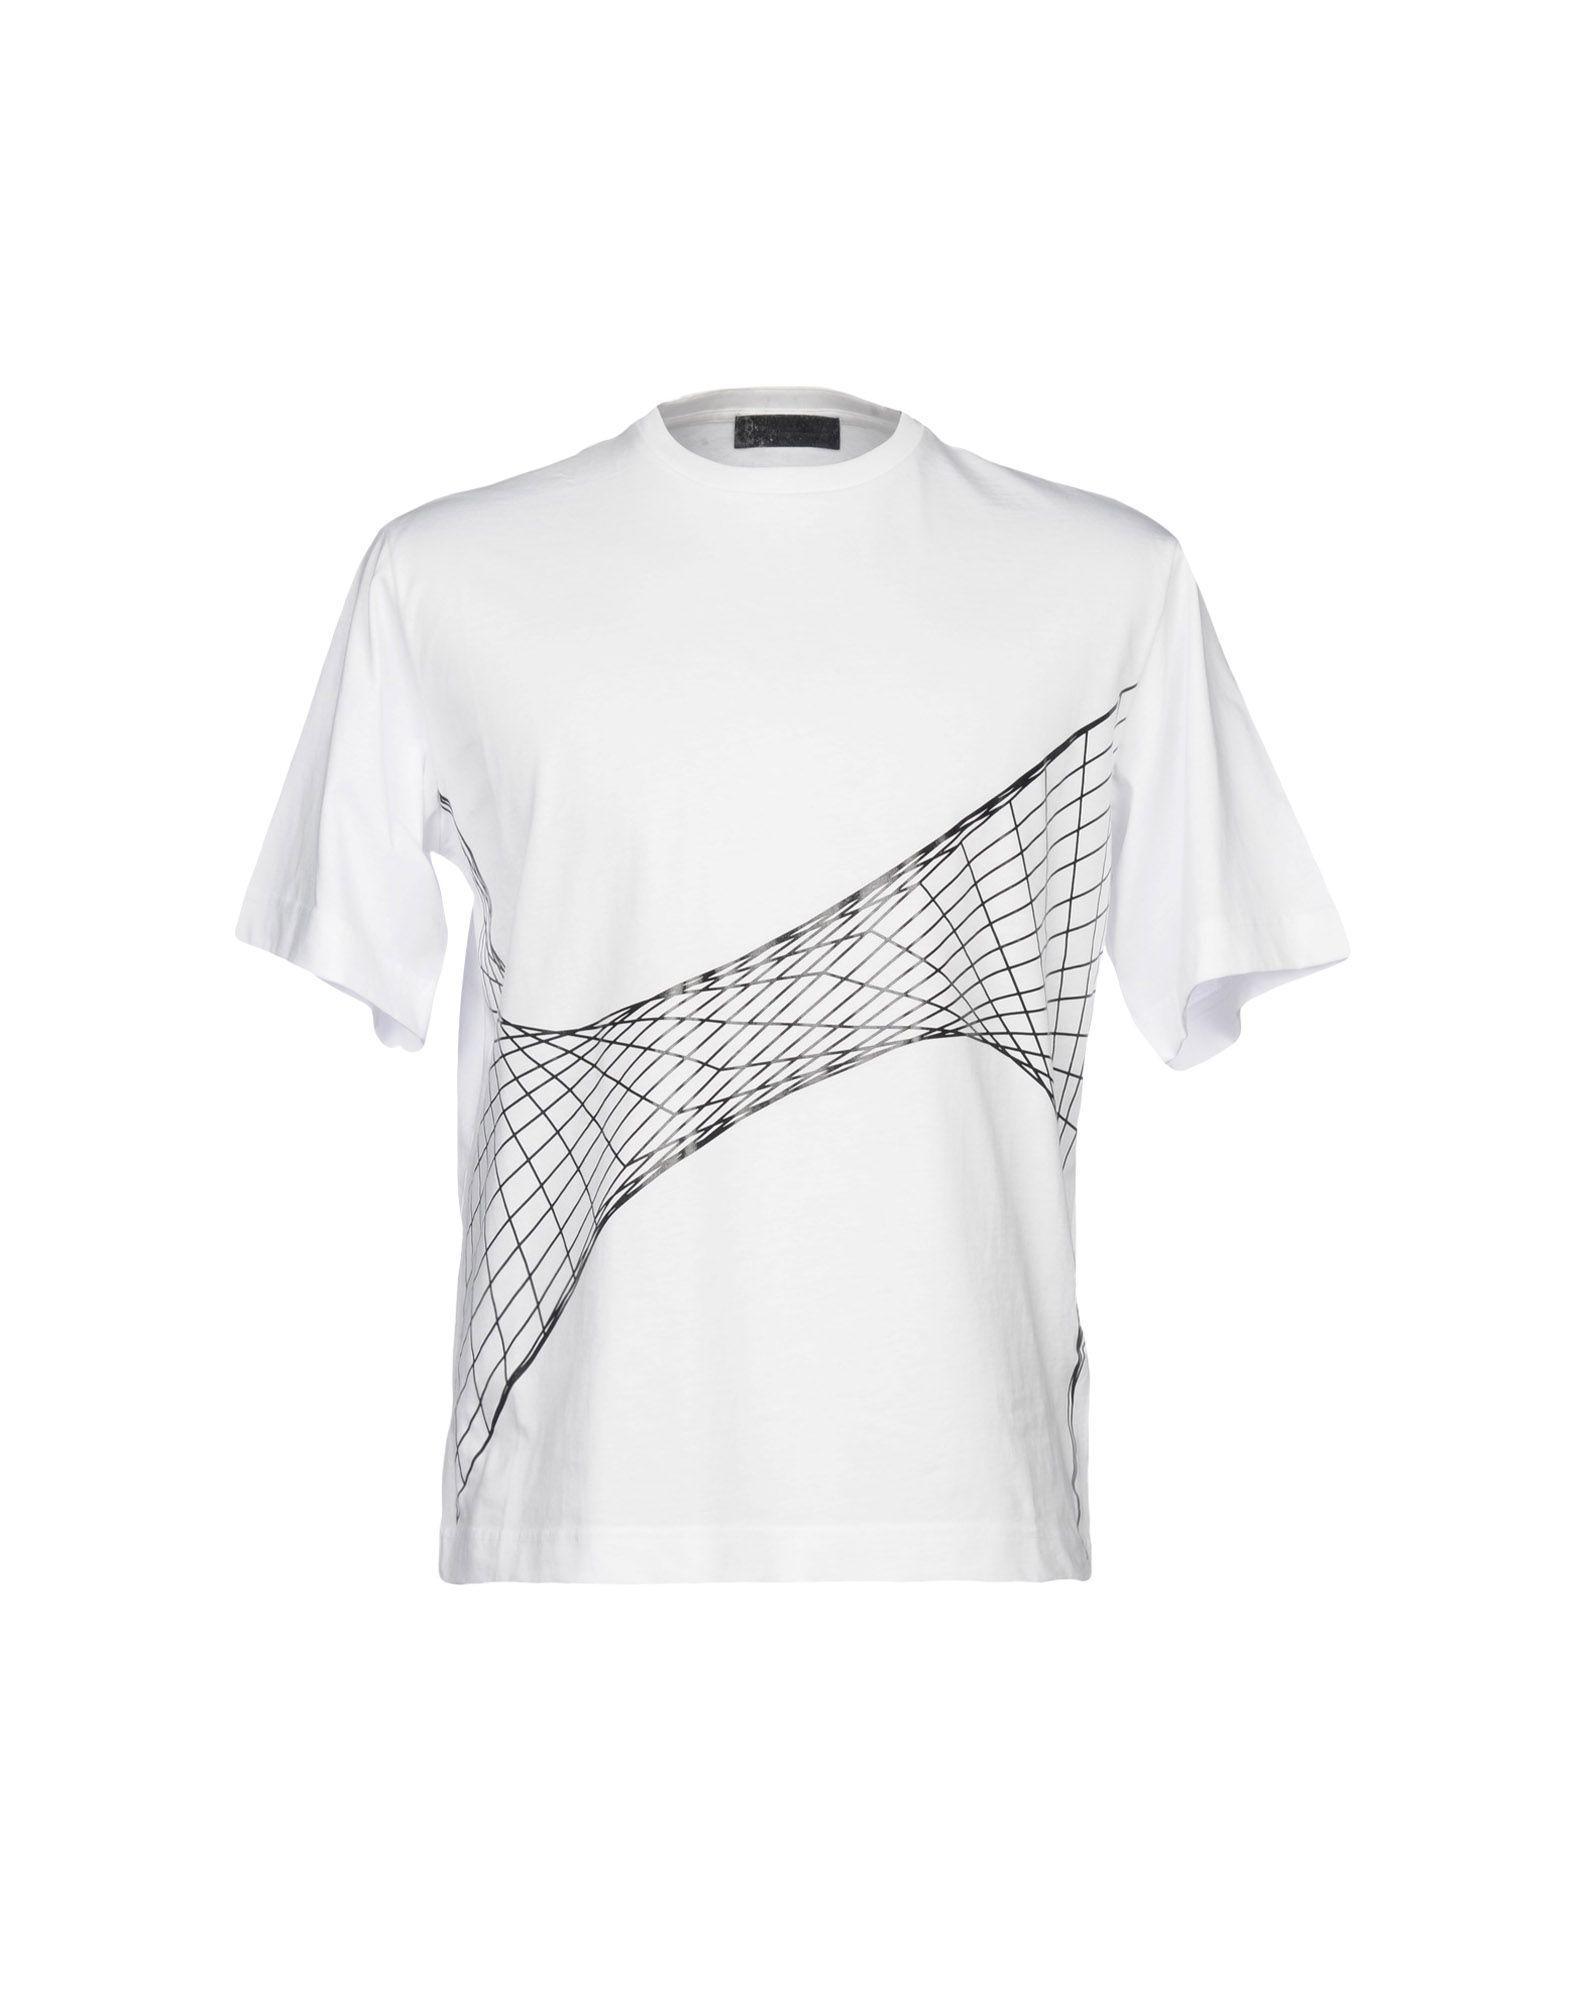 Diesel Black Gold T-Shirt In White